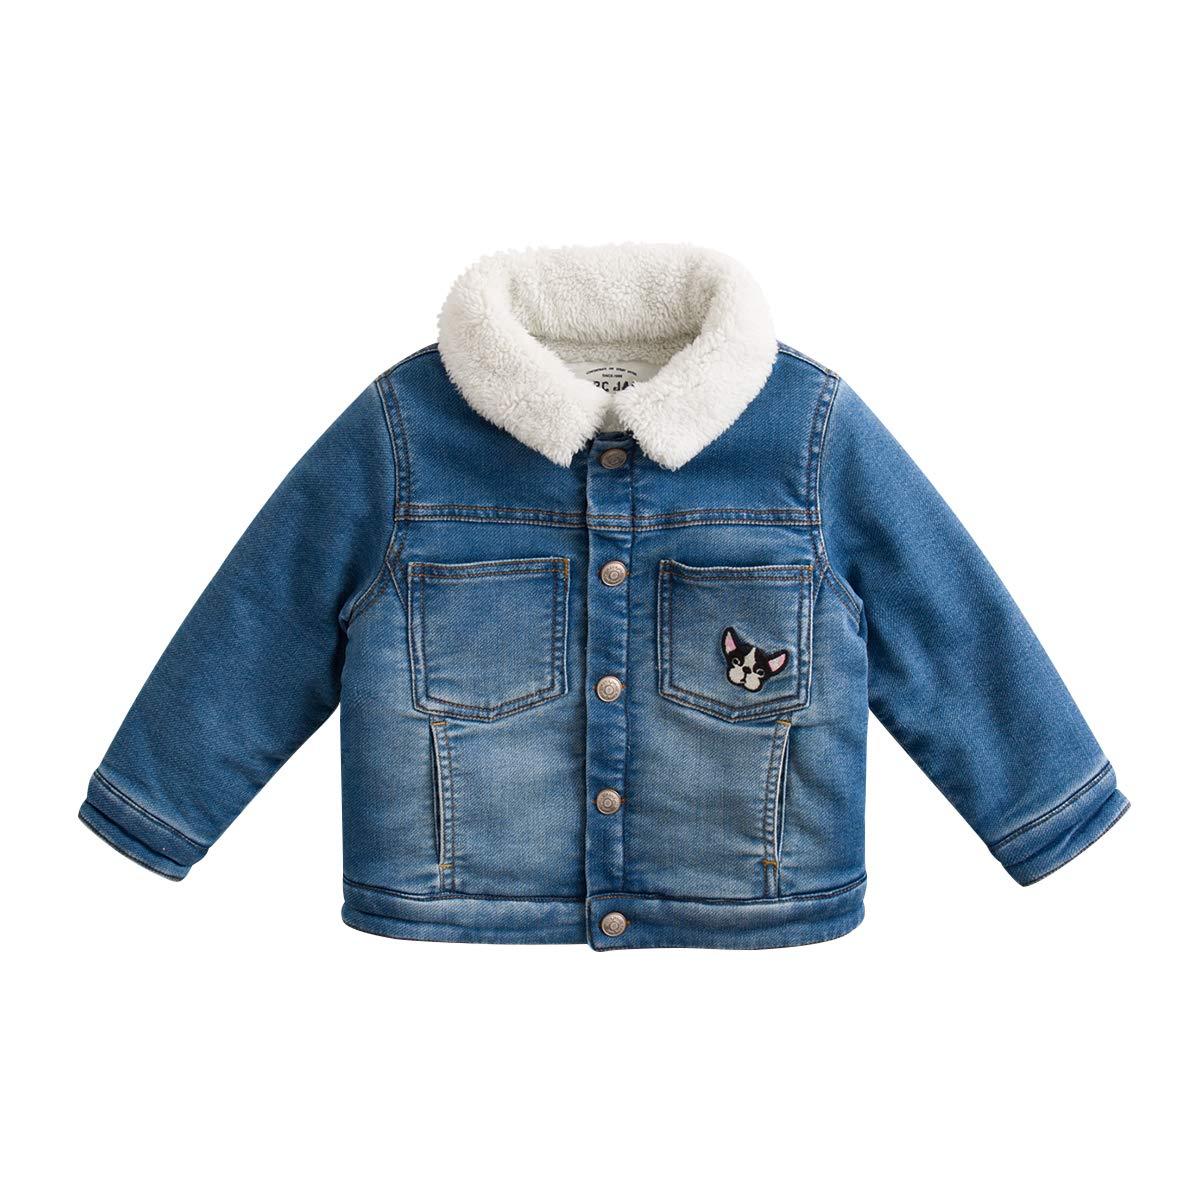 marc janie Little Boys Girls' Thick Denim Jacket Baby Fleece Lined Jacket Coat Denim Blue 70132 3T (90 cm)